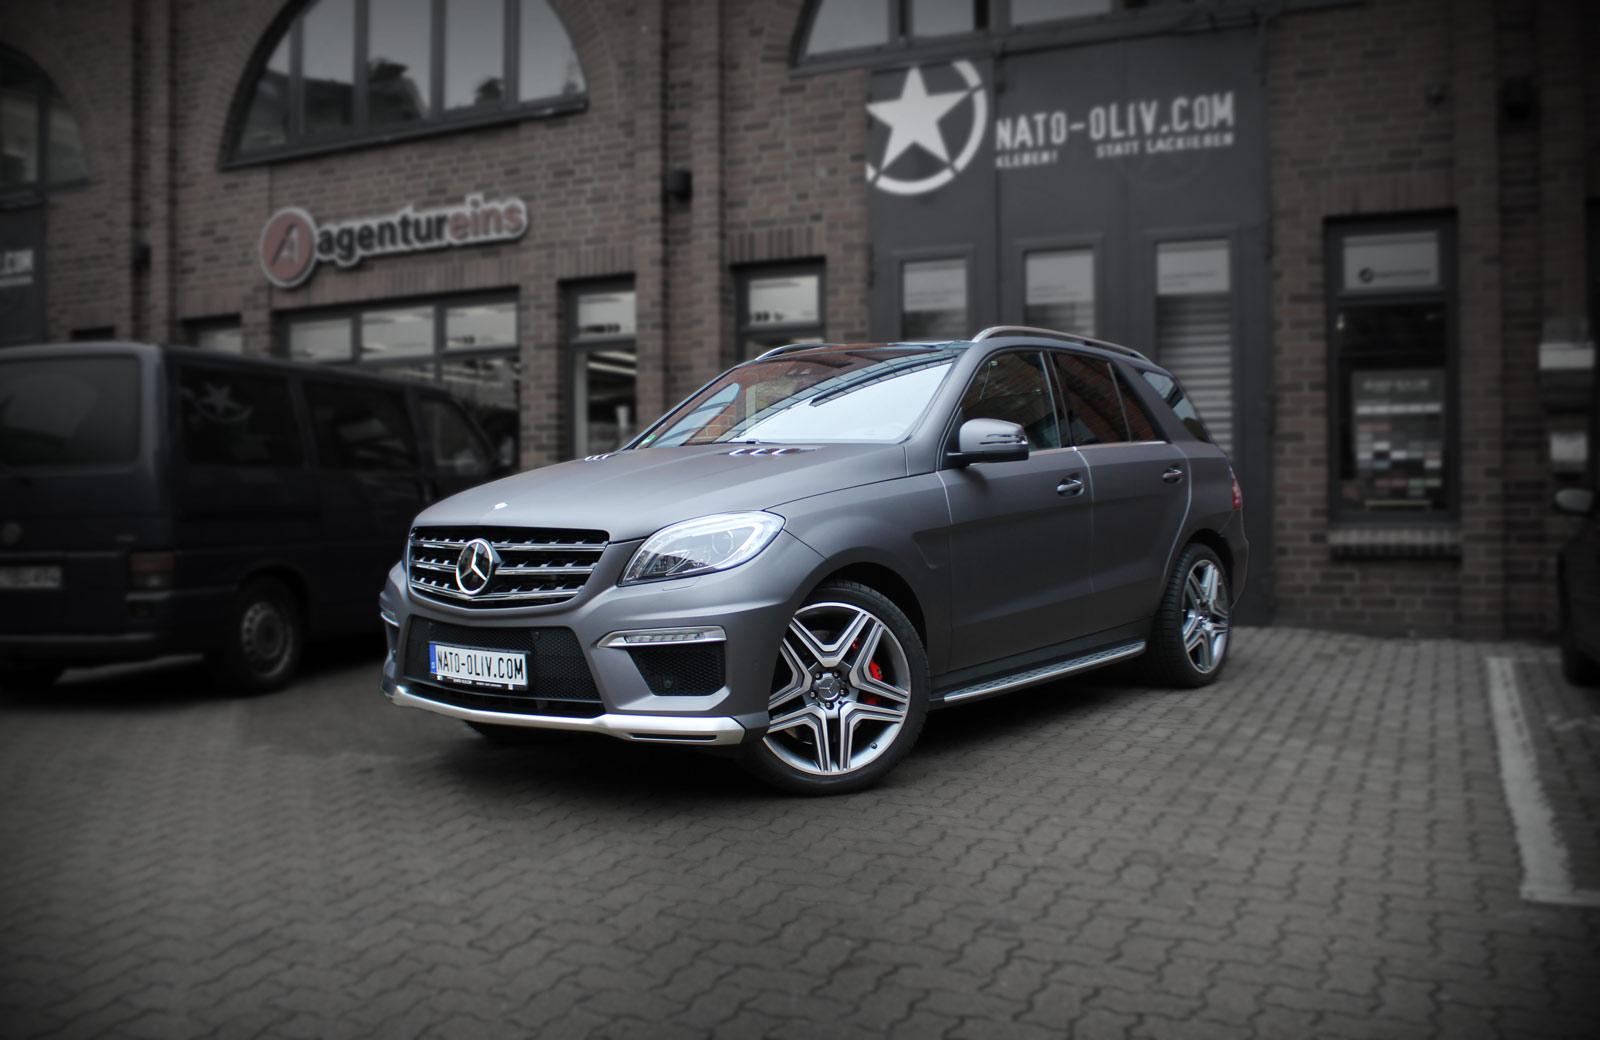 Mercedes ML 63 AMG foliert in Anthrazit matt metallic.